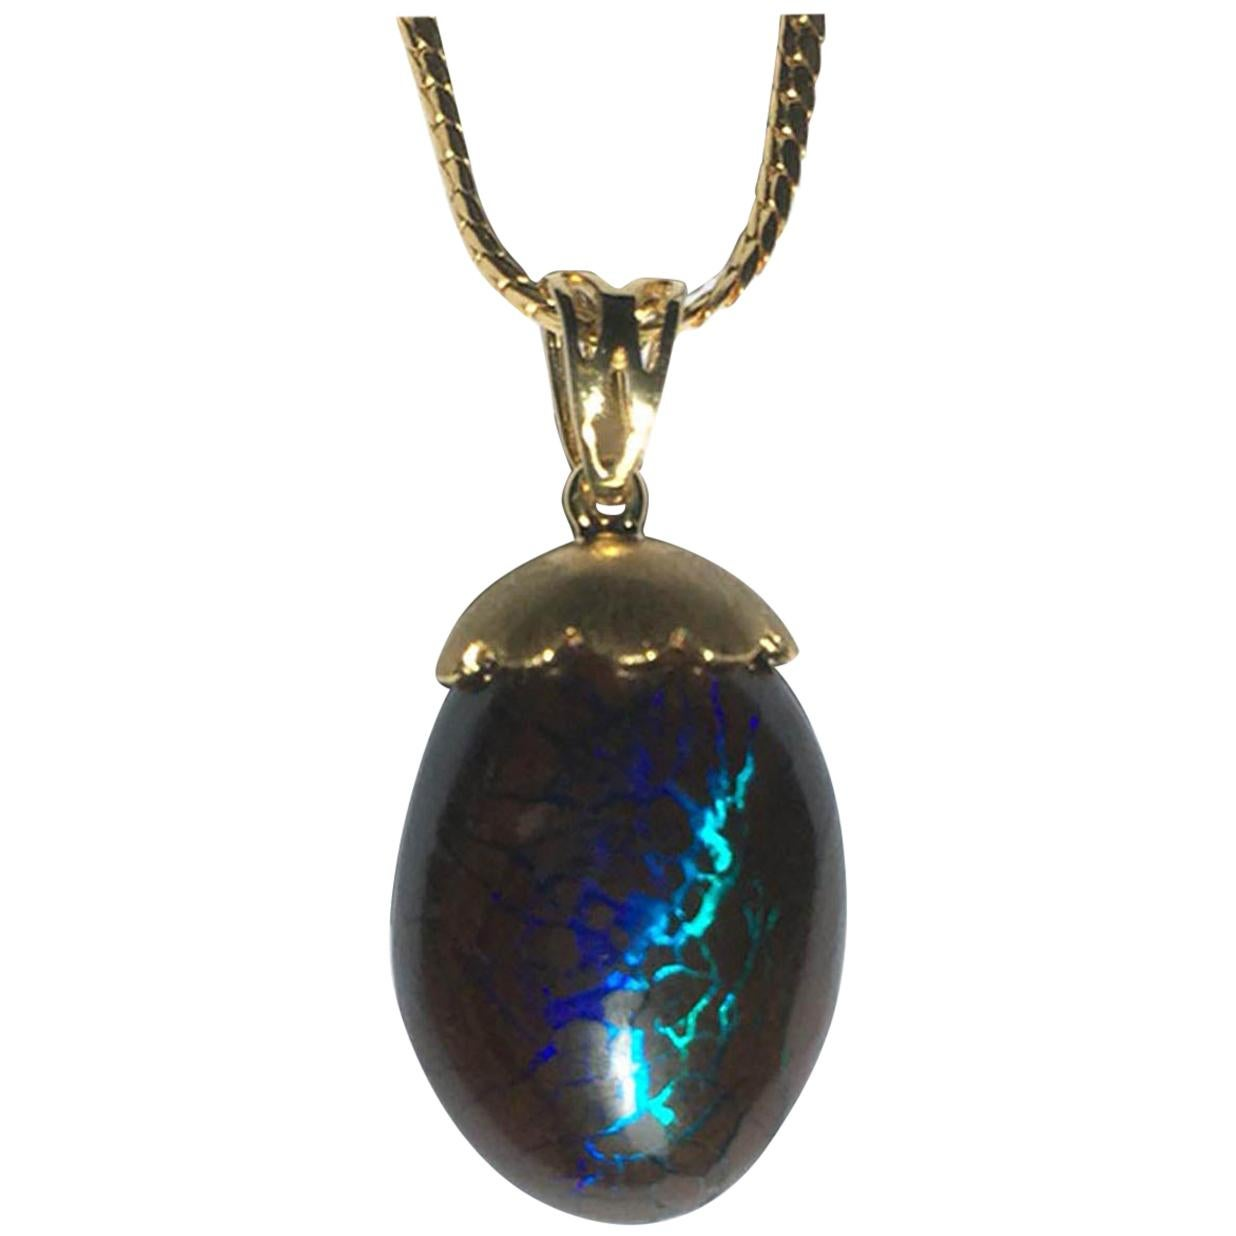 23kt Thai Gold Necklace and 18kt Gold Pendant set with Australian Boulder Opal